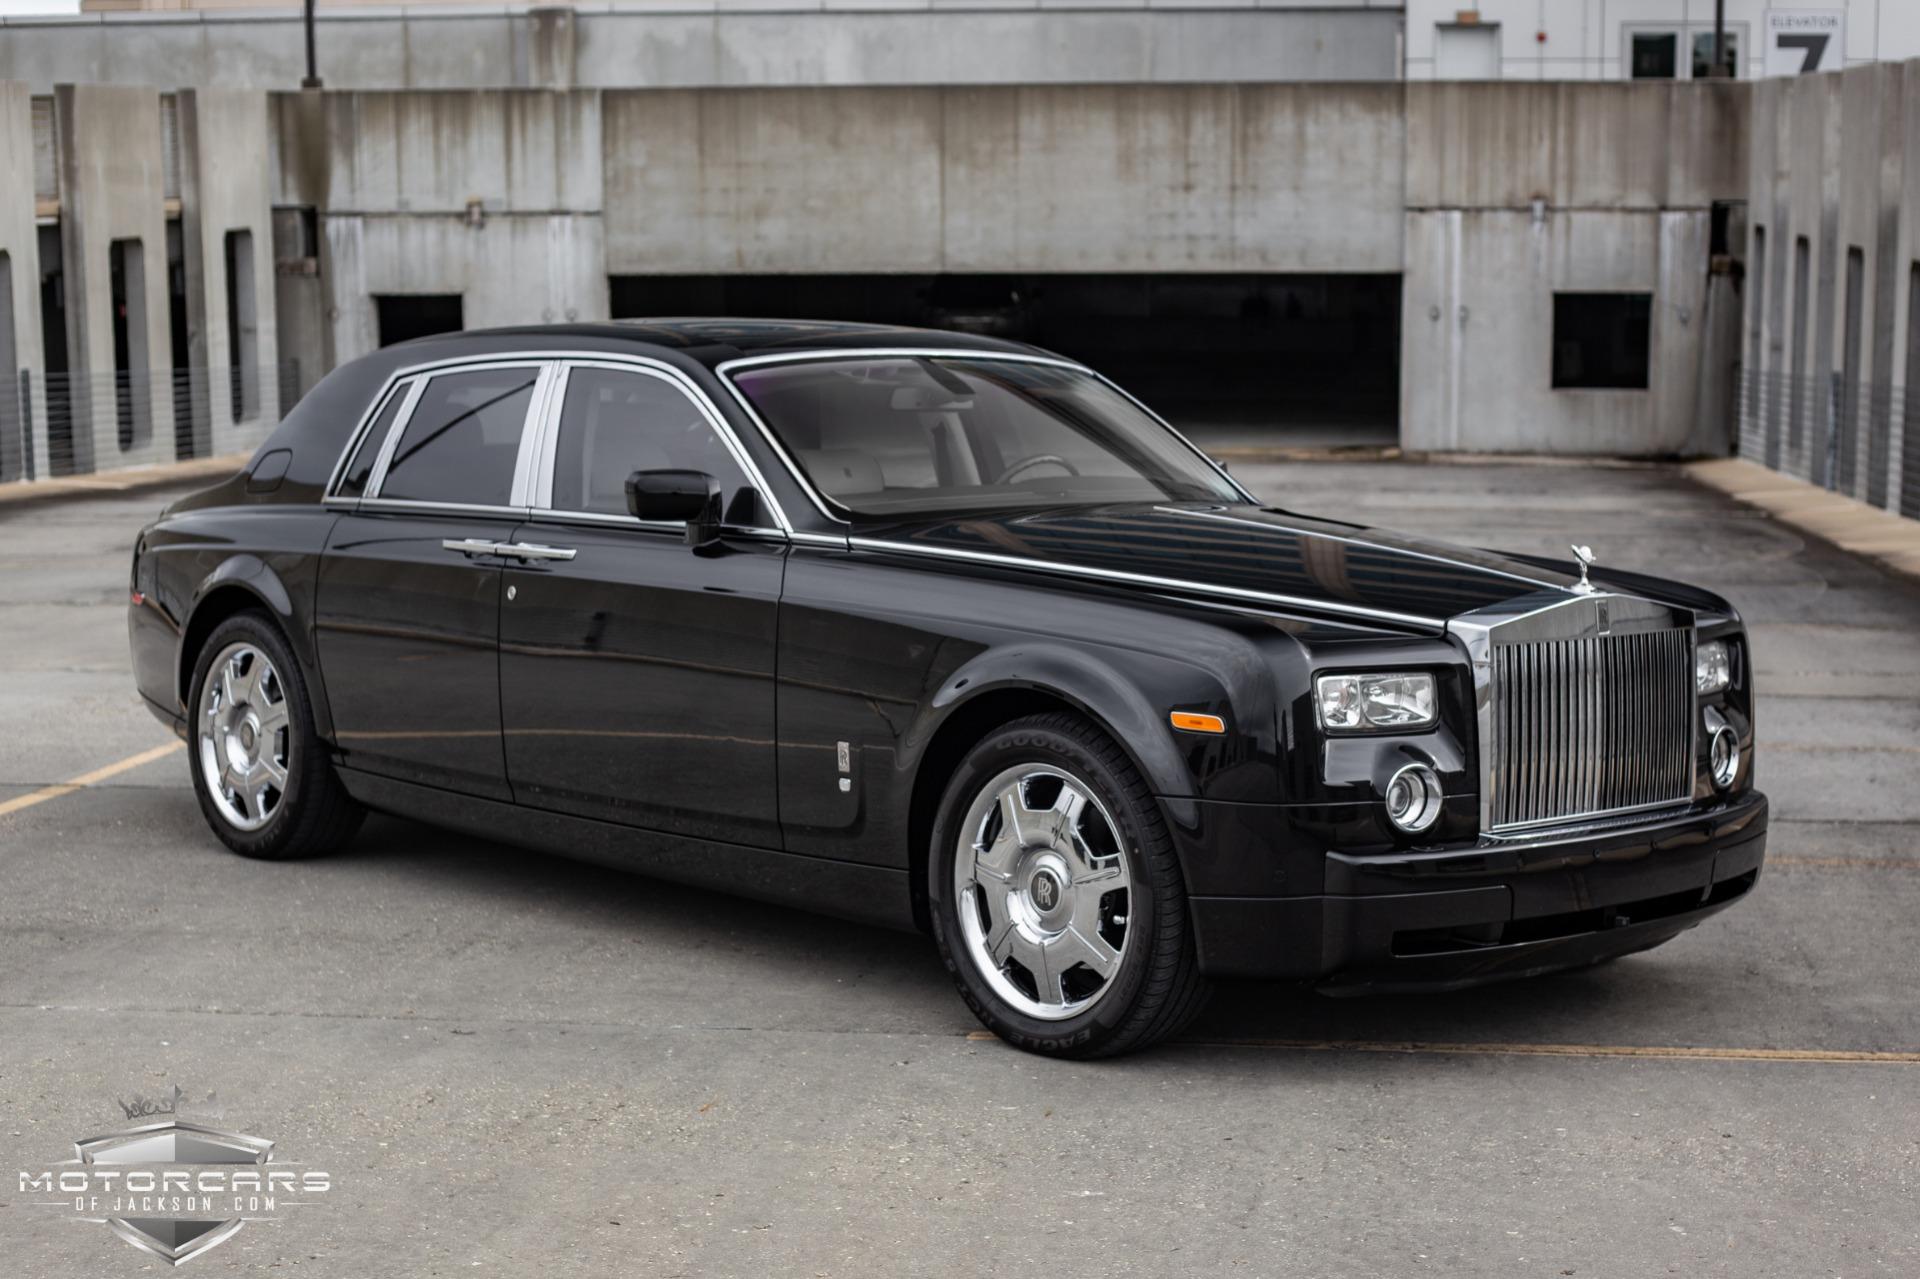 Used-2006-Rolls-Royce-Phantom-for-sale-Jackson-MS